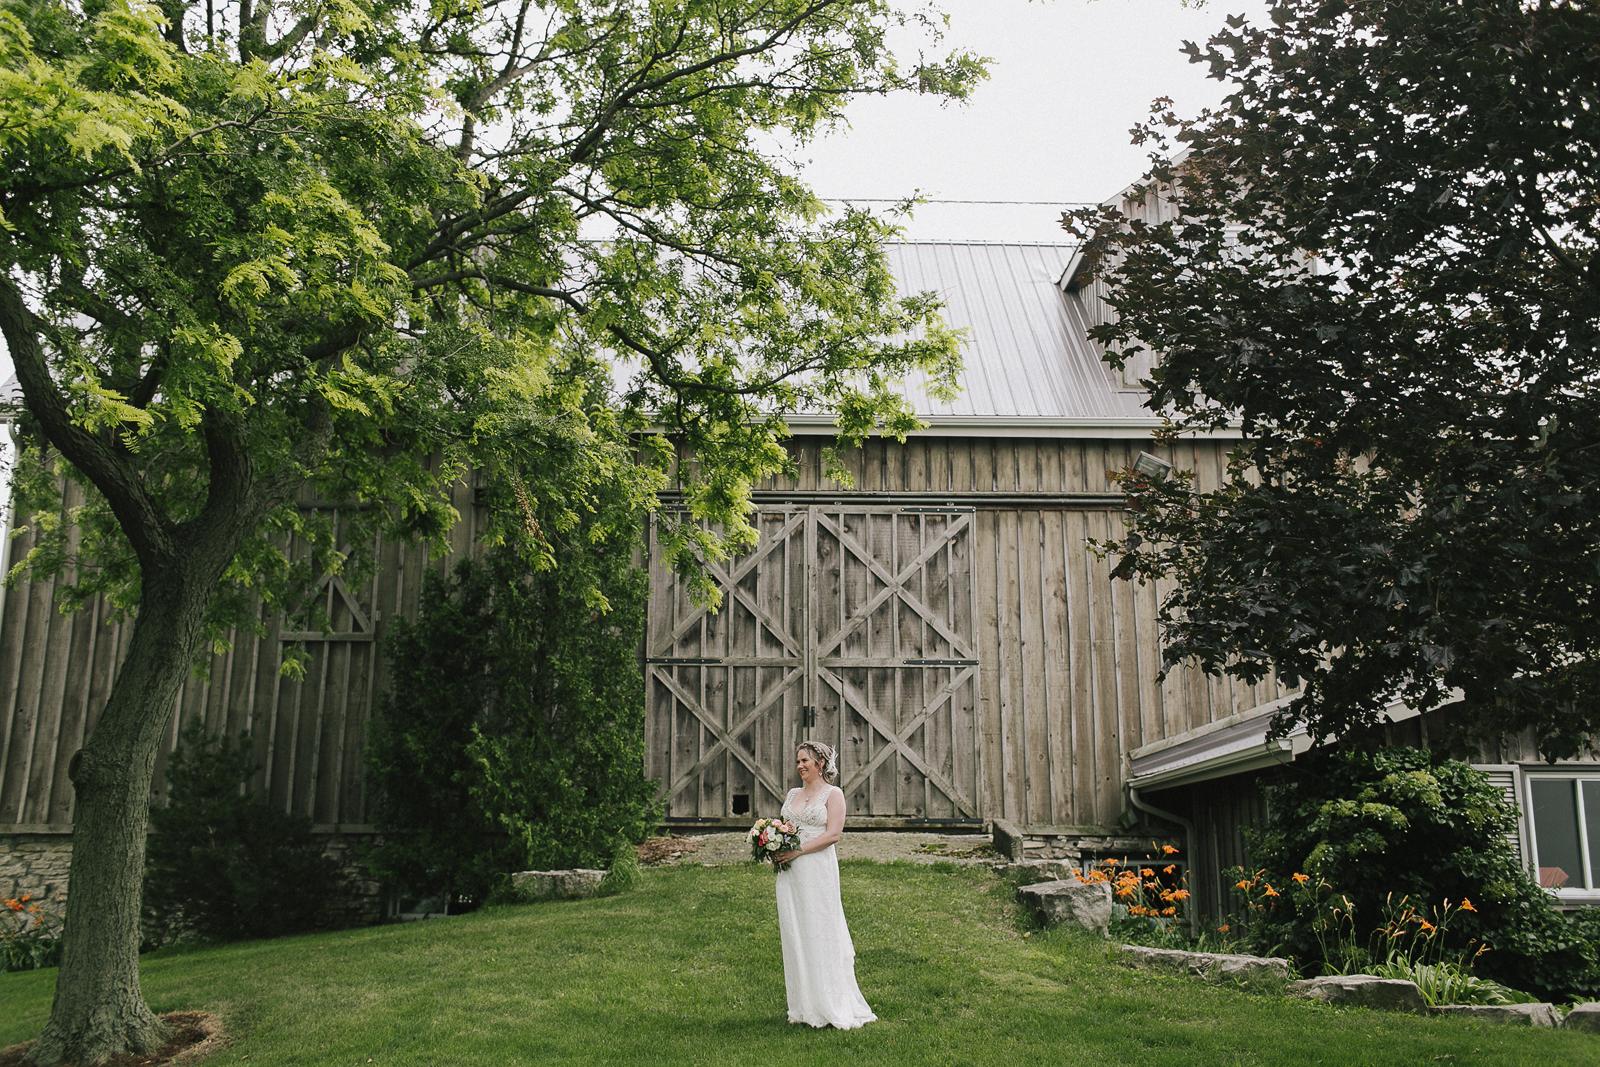 mike-and-jenni-wedding-132.jpg